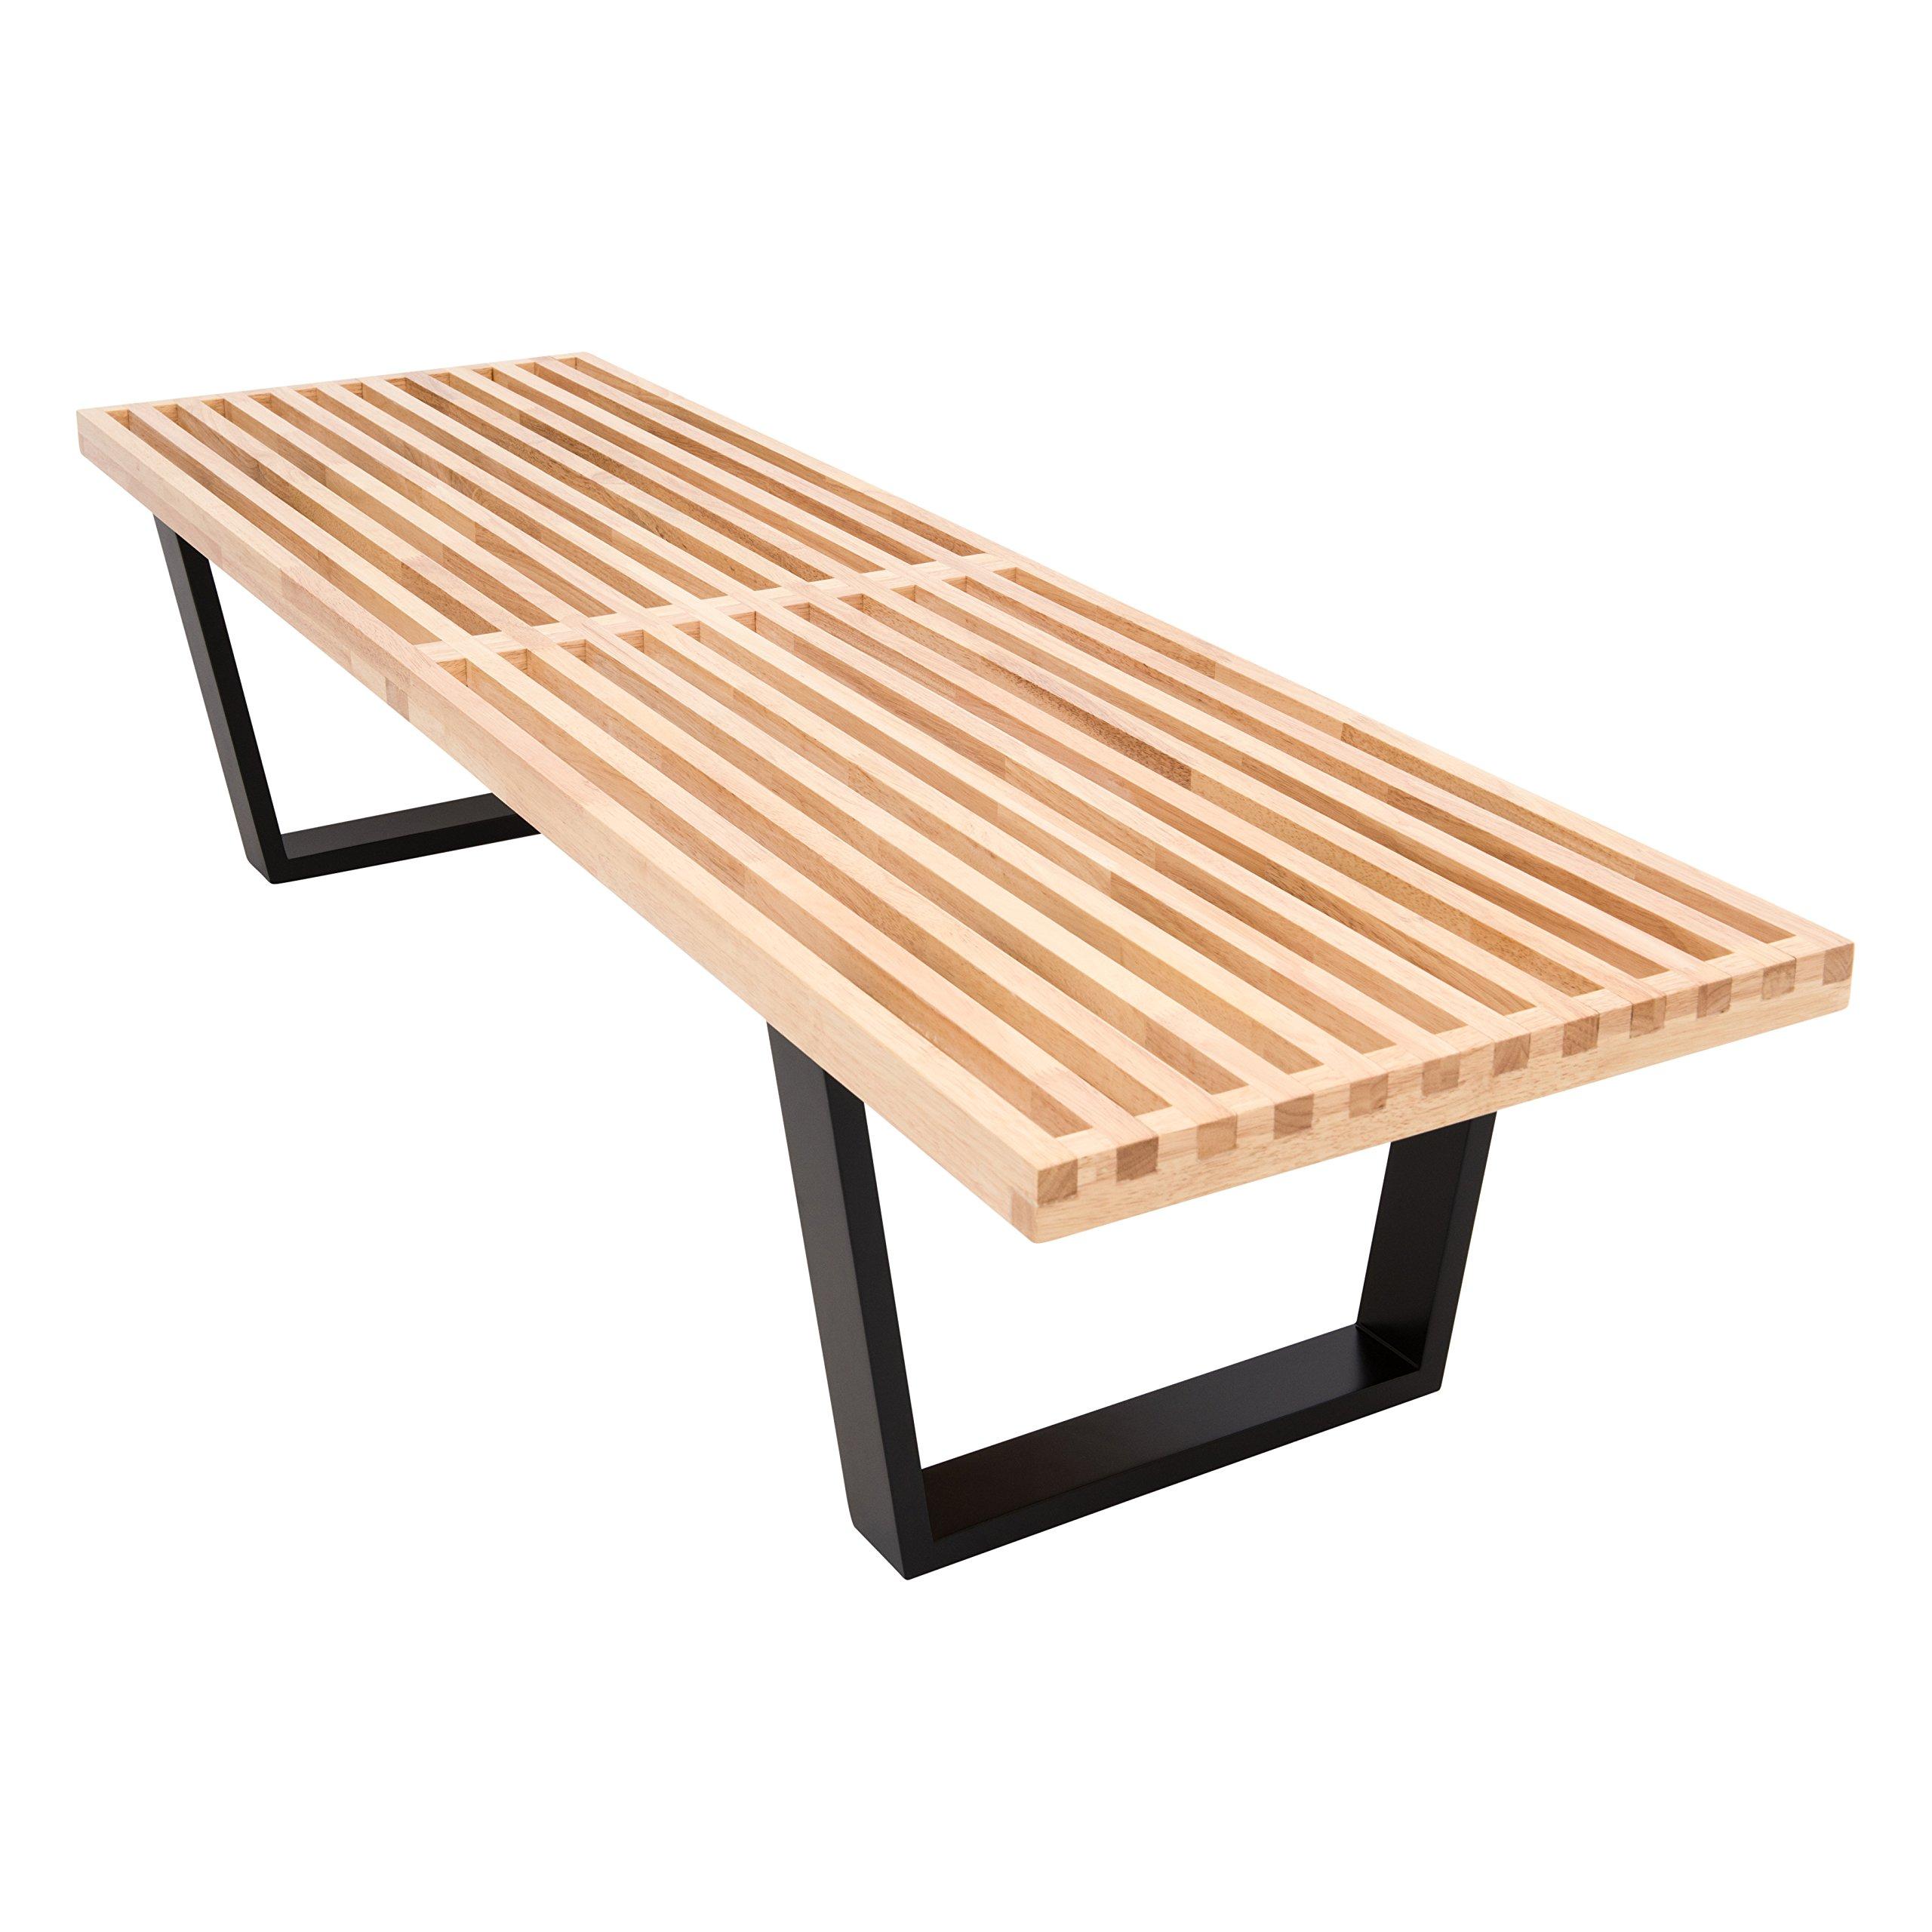 LeisureMod Mid-Century Lynwood Platform Bench in 5 Feet (Natural Wood)